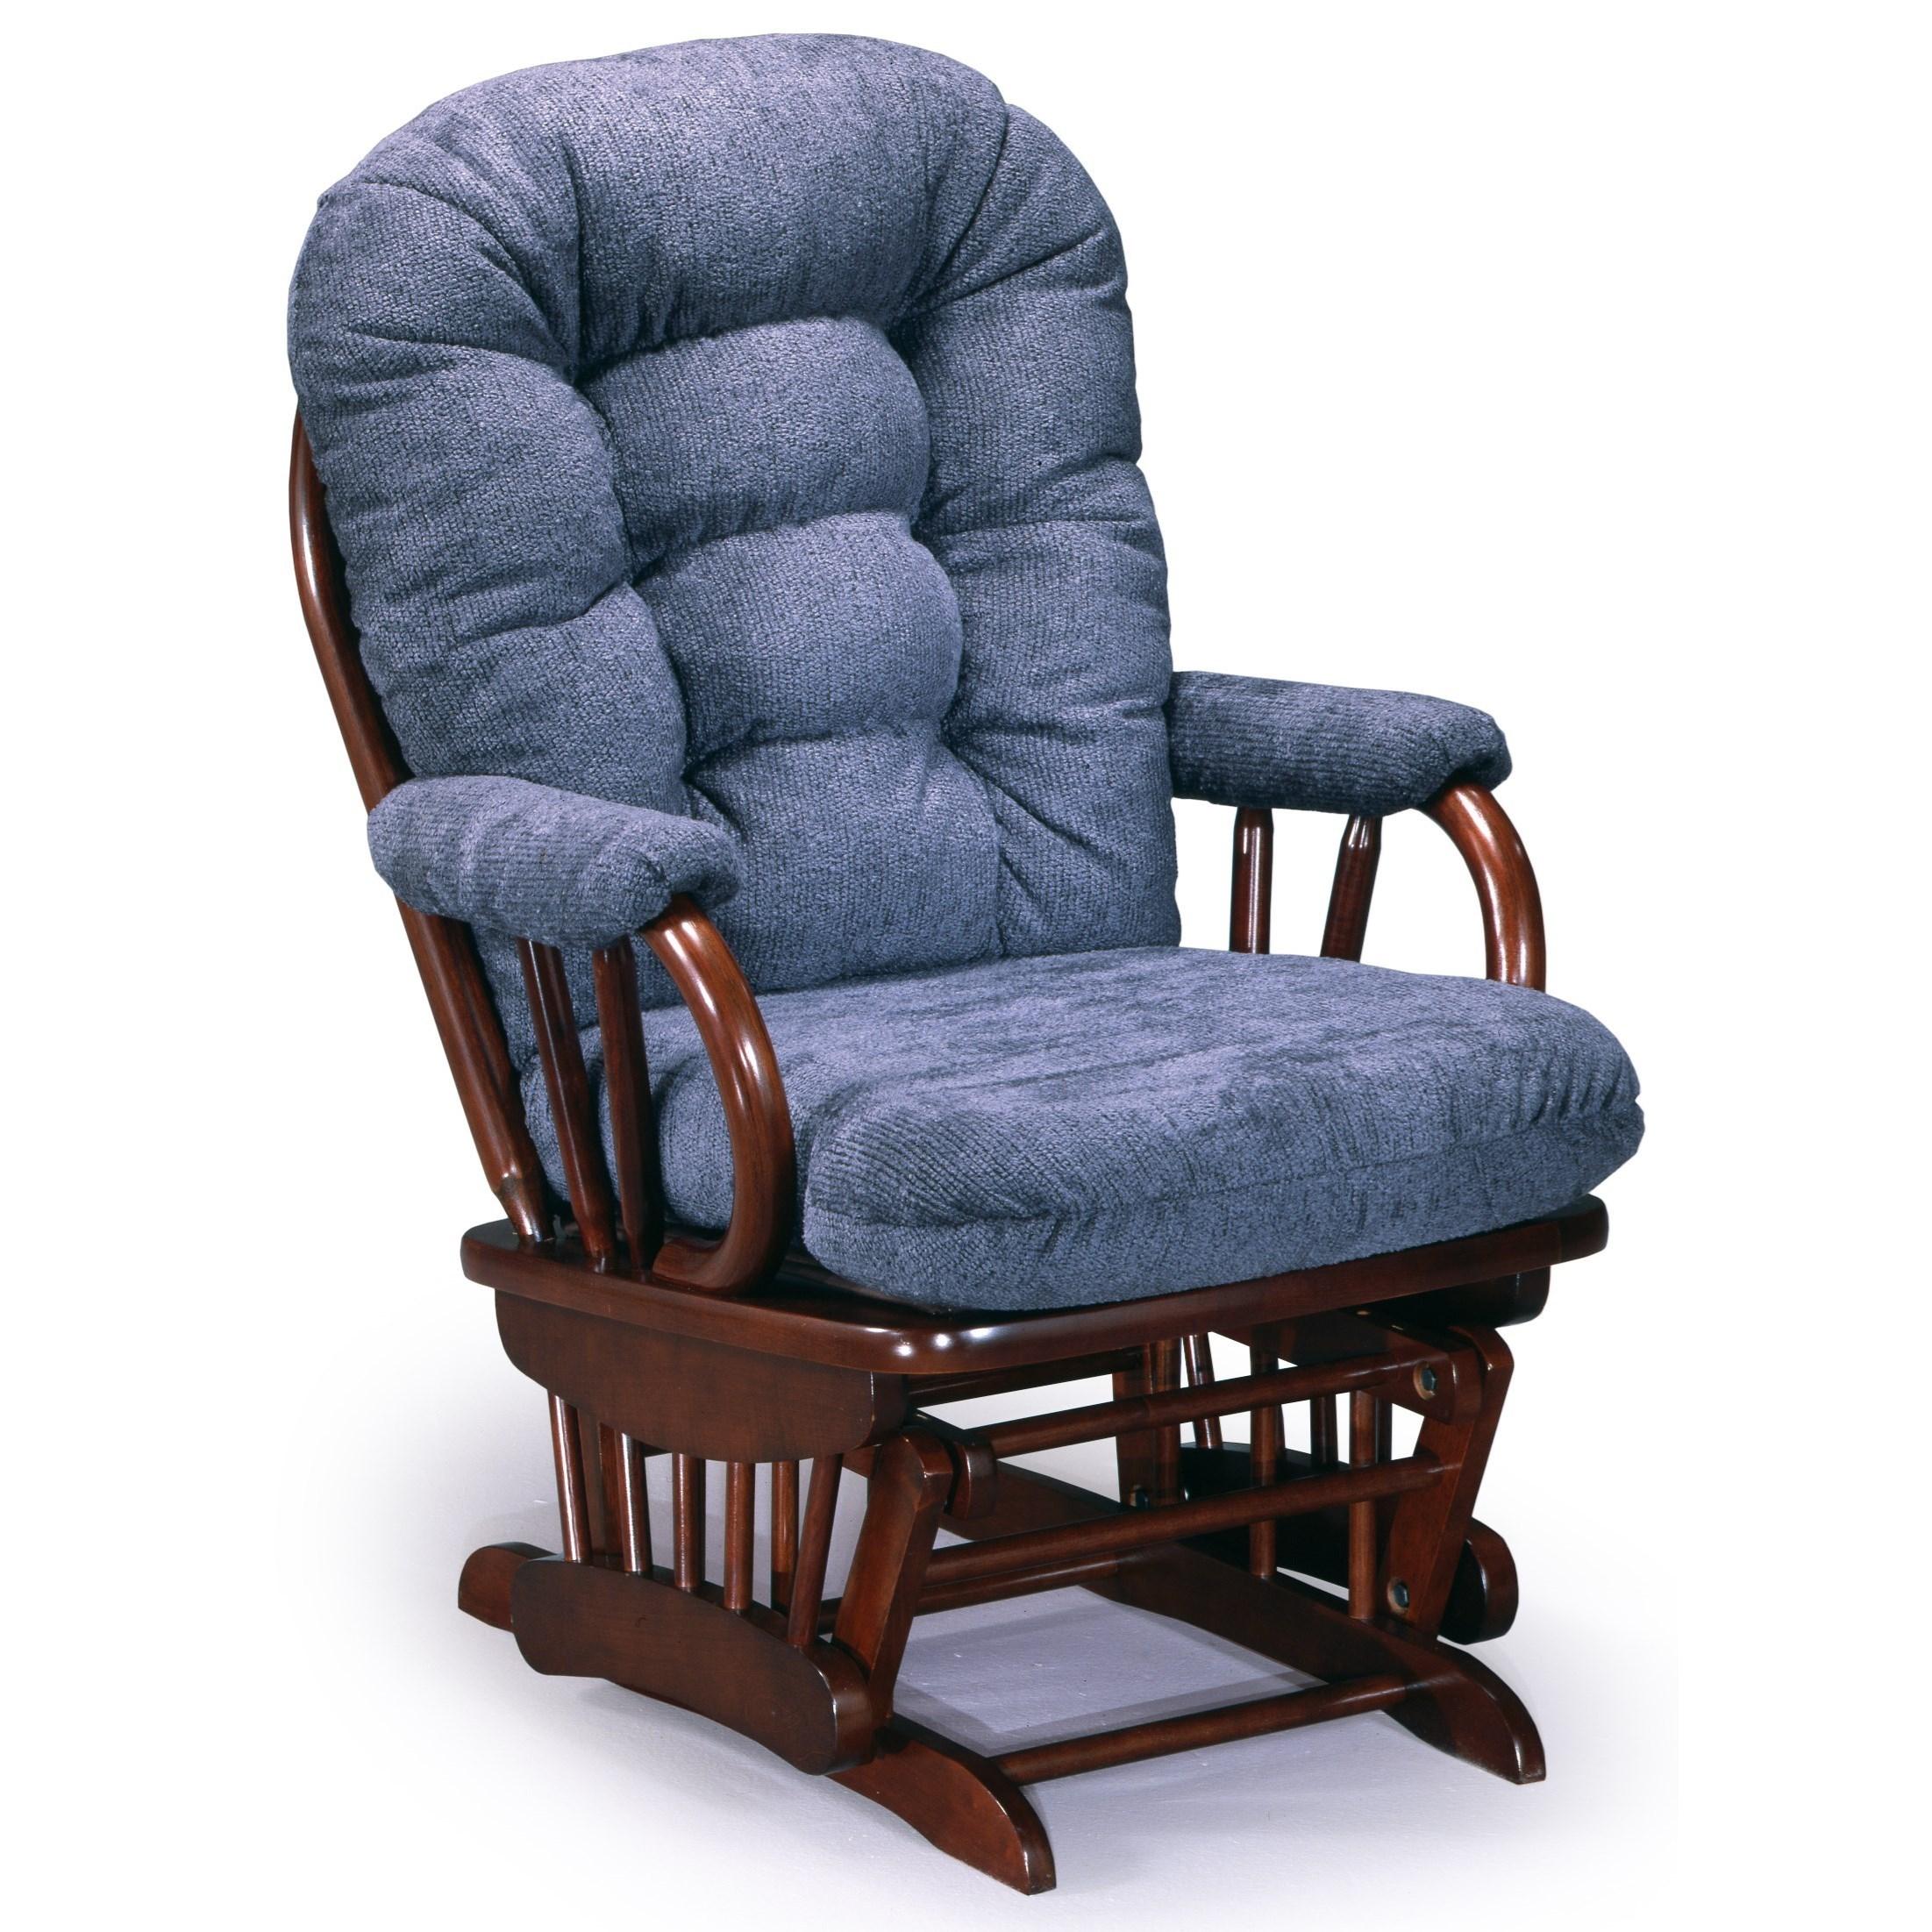 Best home furnishings glider rockers sona glider rocker for Furniture gliders